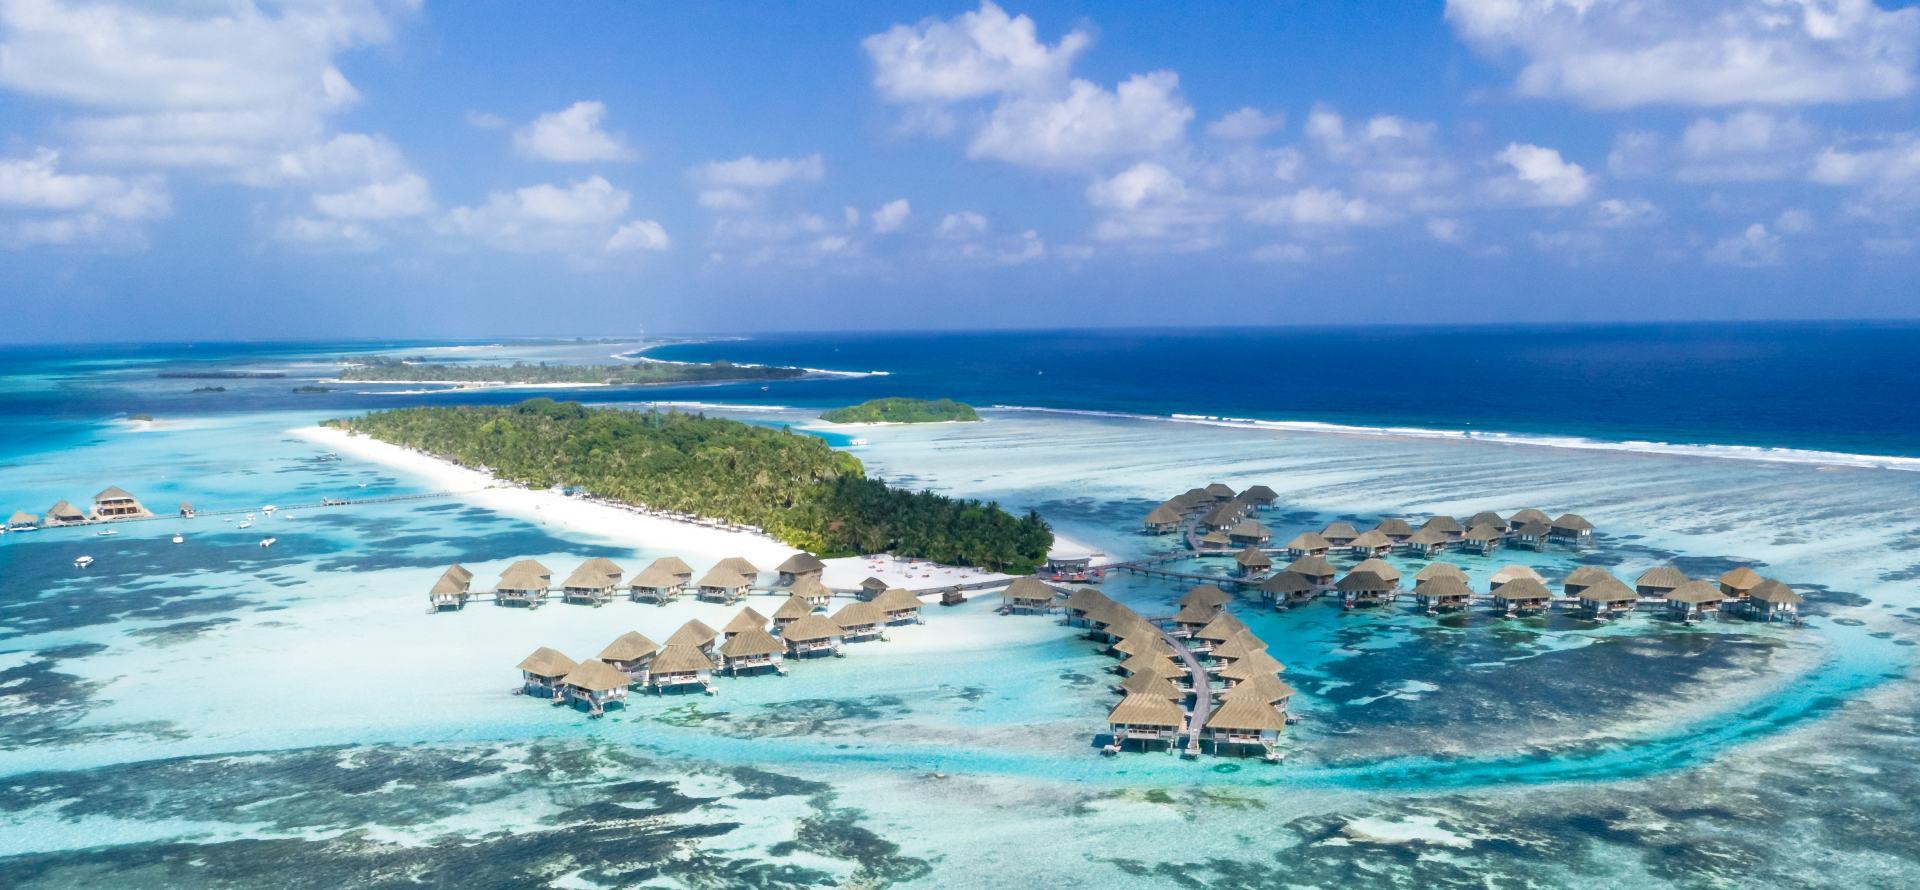 assorted-beach-hutts-1287452